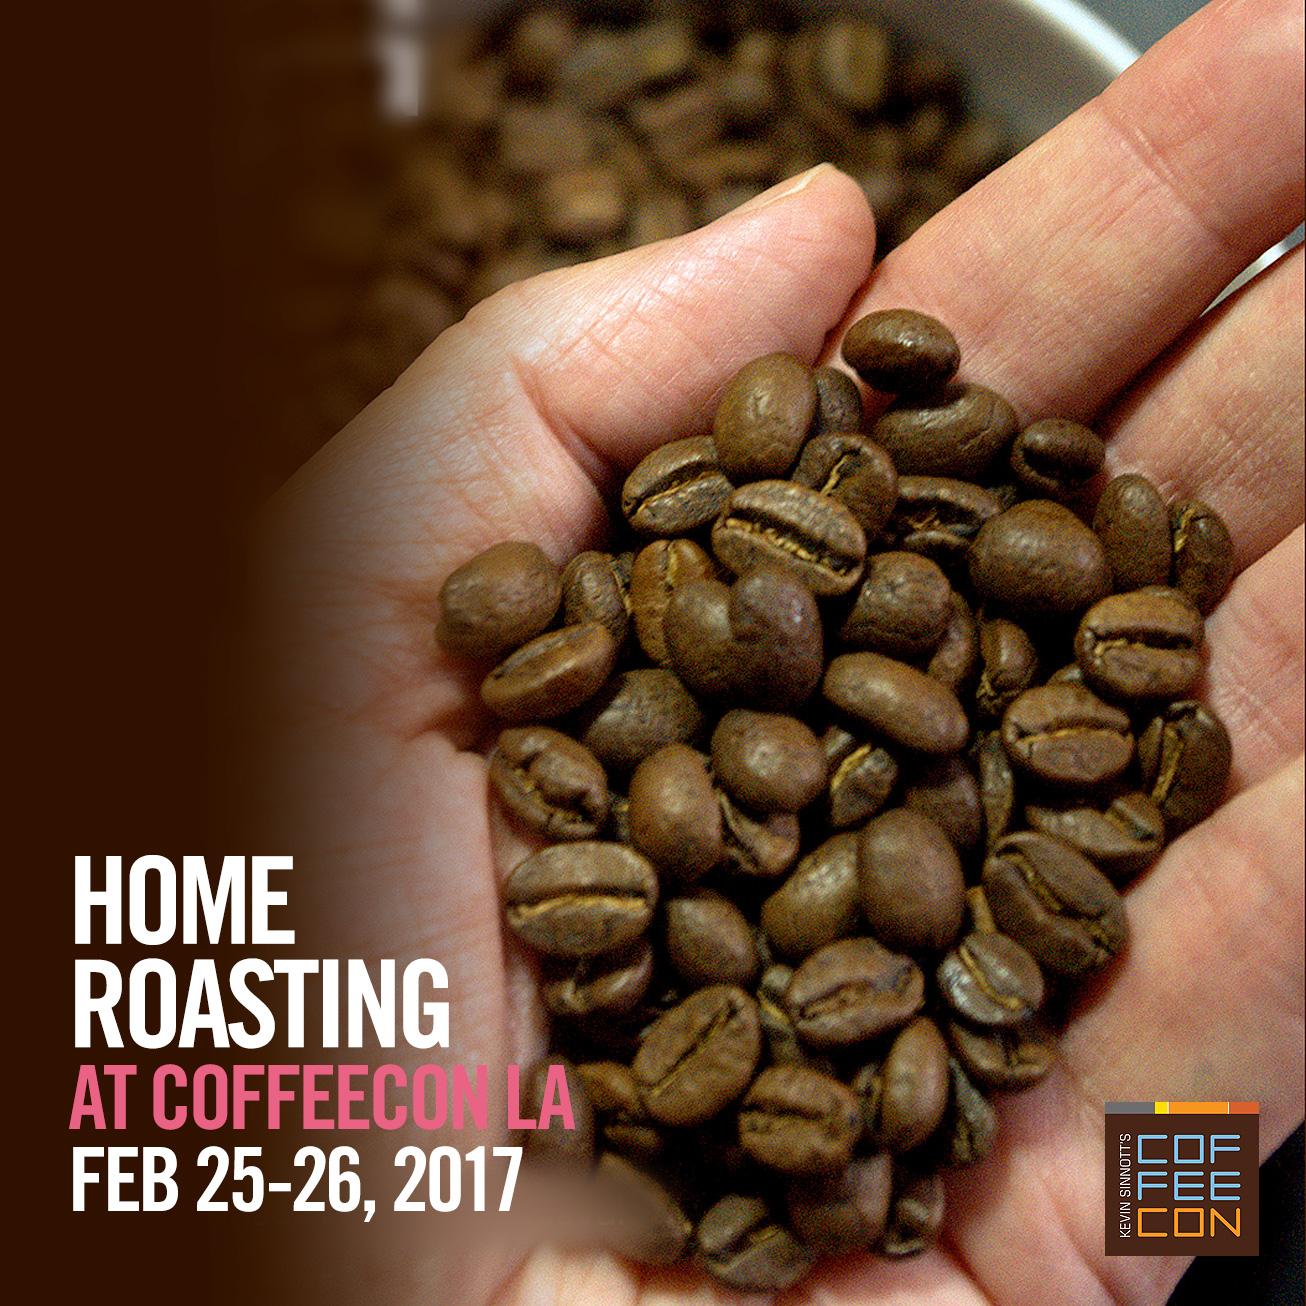 Home Roasting Coffee at CoffeeConLA